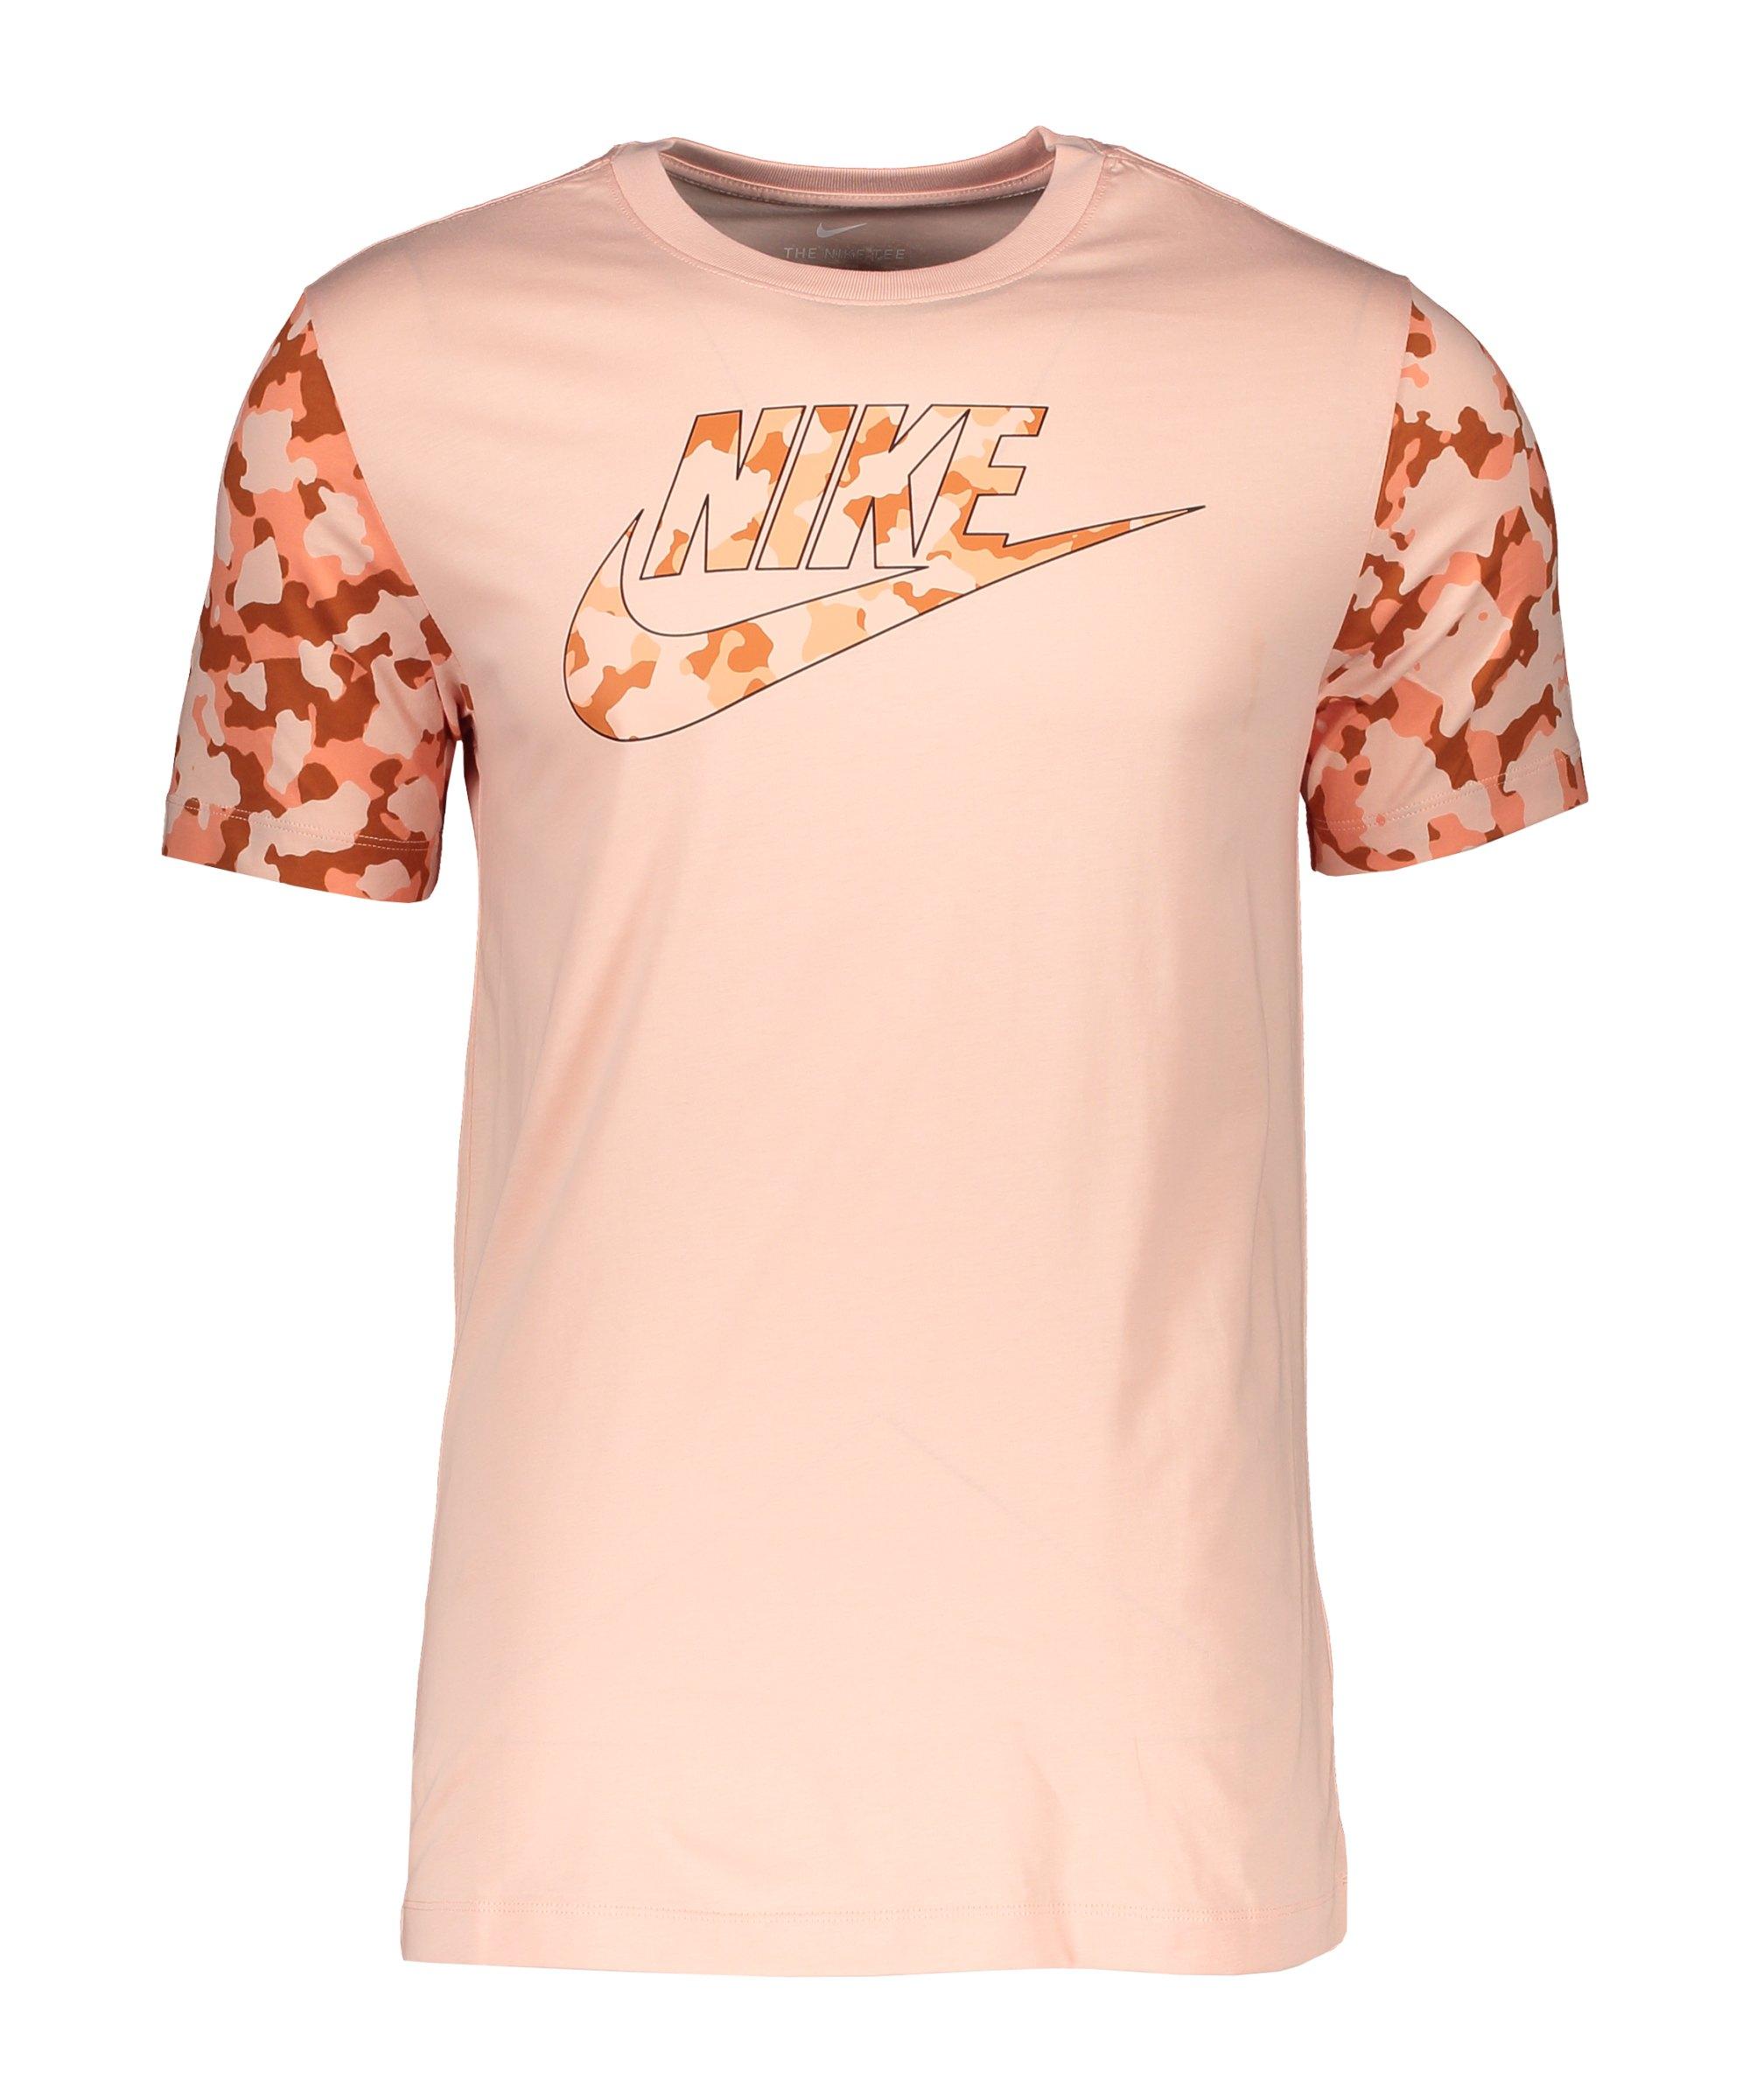 Nike Classic Graphic Camo T-Shirt Rosa F800 - orange